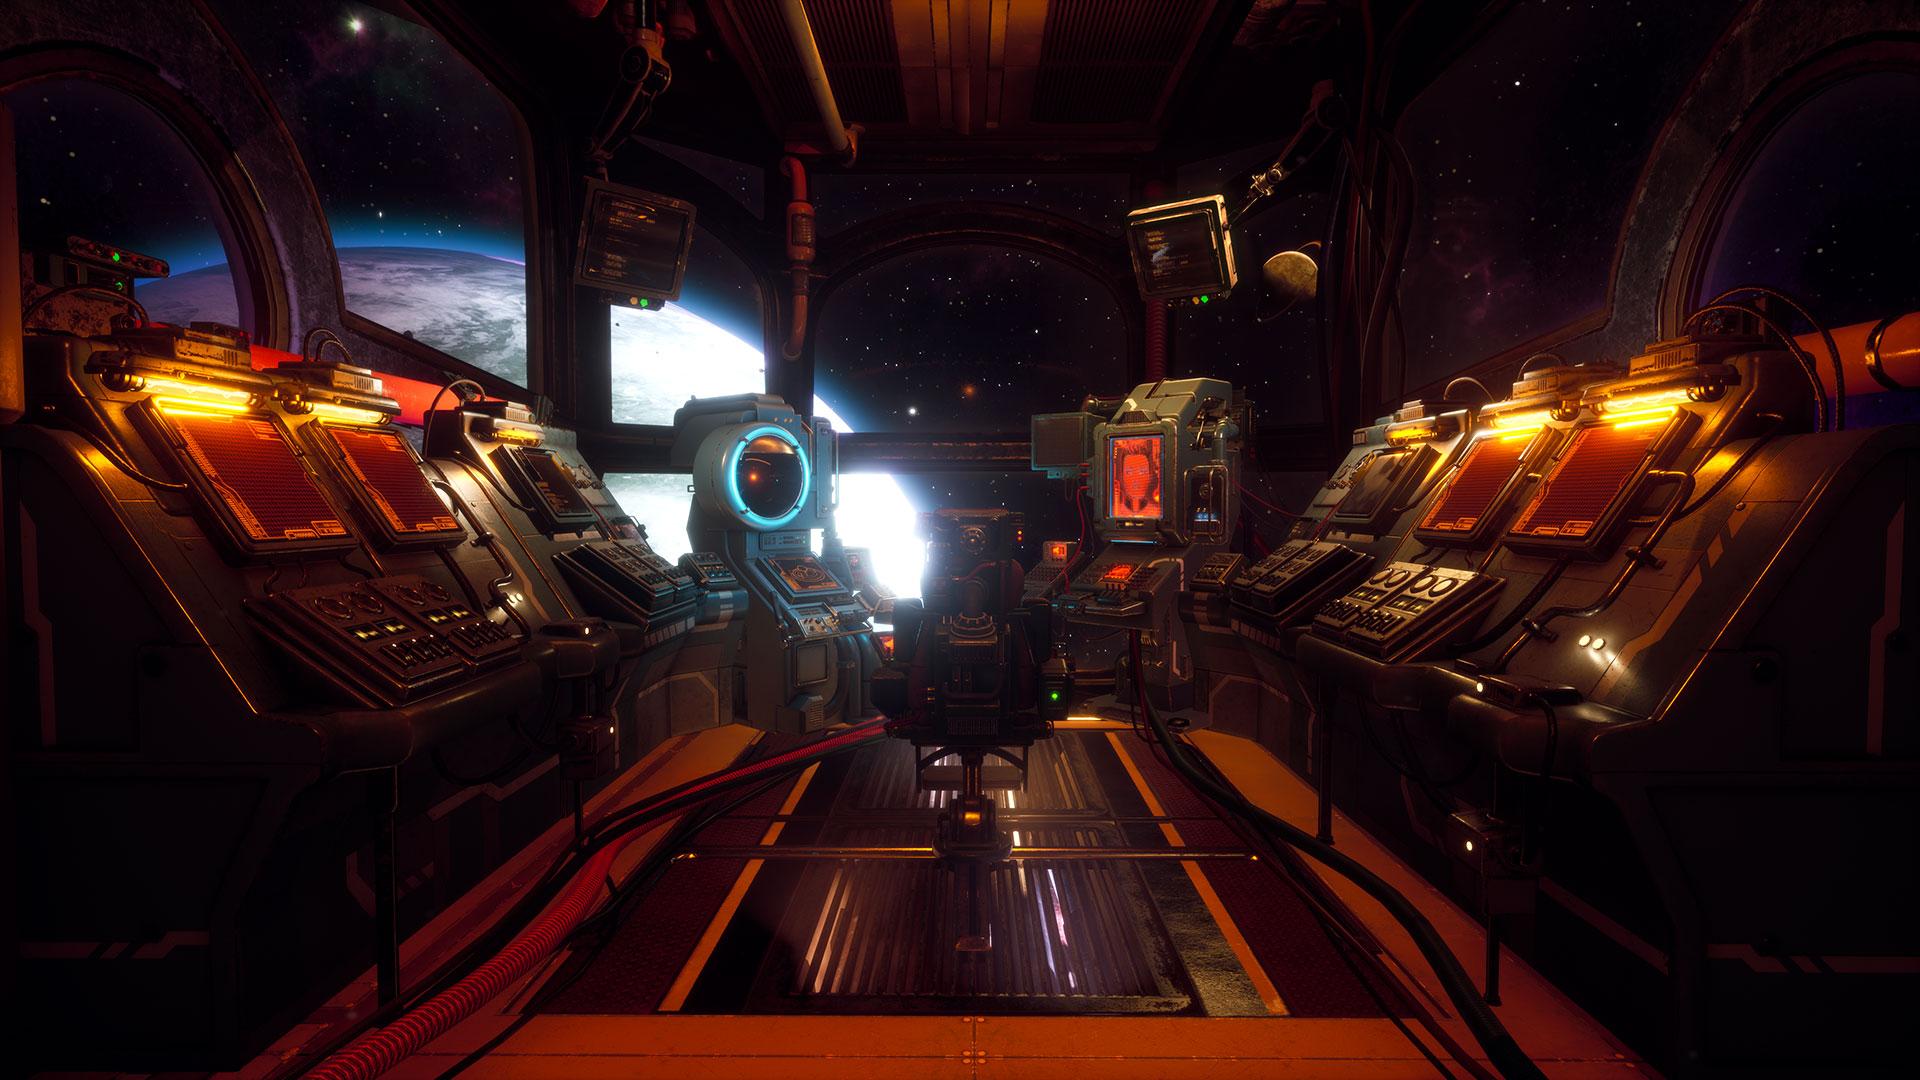 Ролевой шутер The Outer Worlds — следующая игра от Obsidian Entertainment